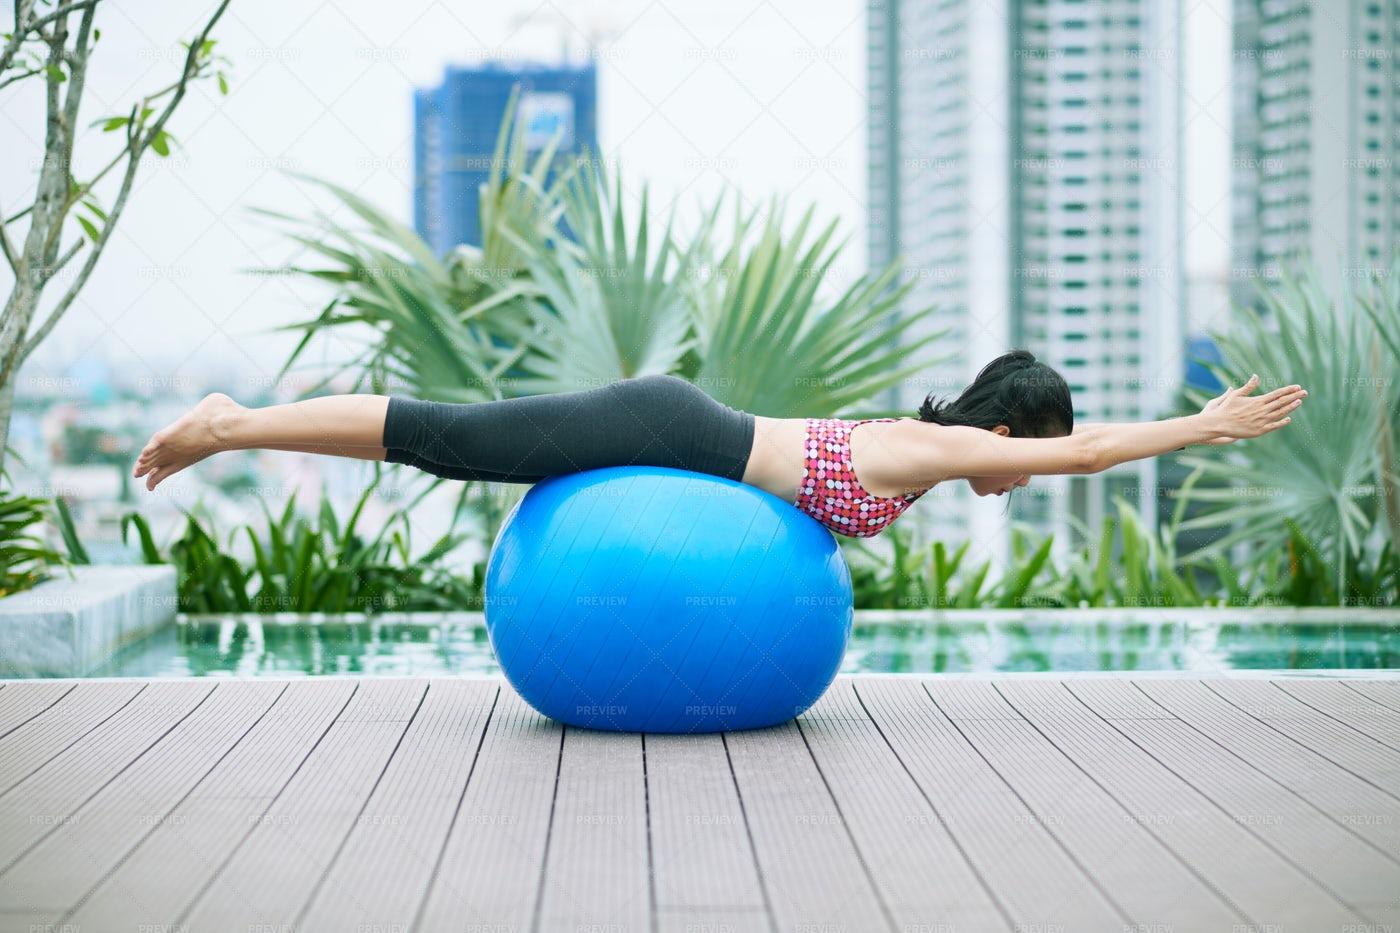 Girl Exercising On Fitness Ball: Stock Photos